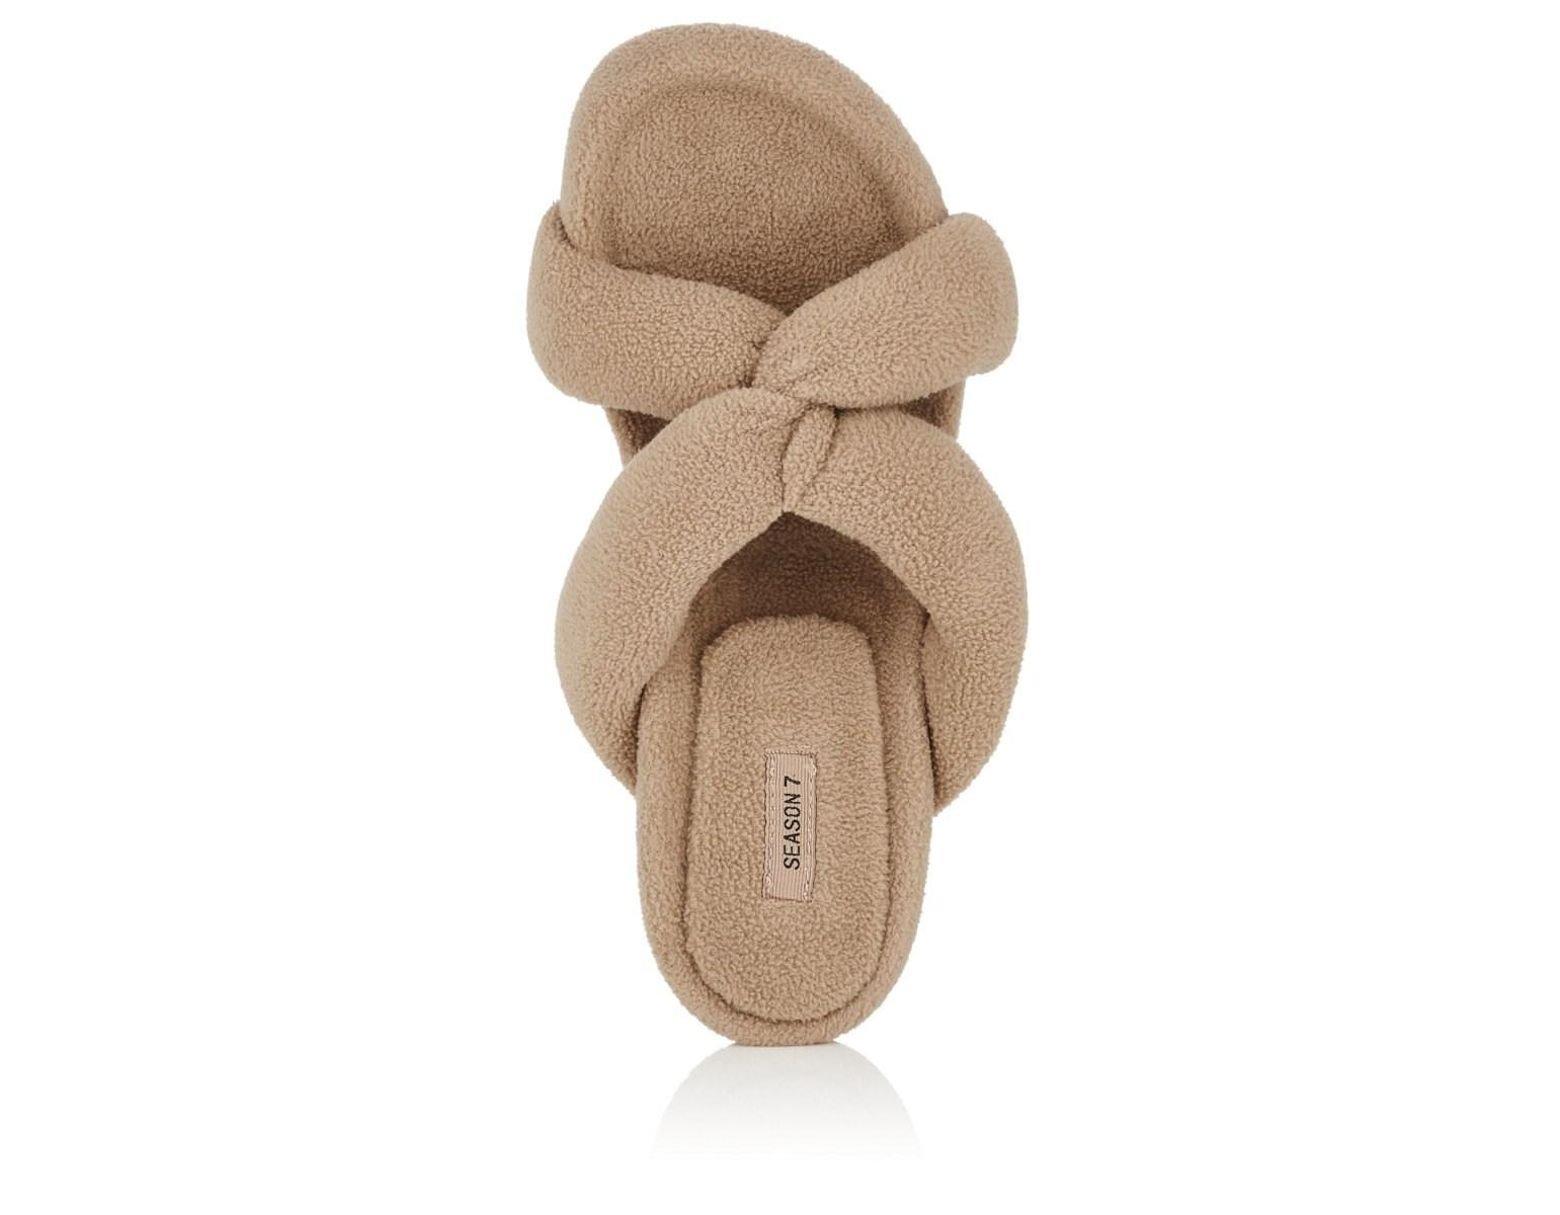 c57dd1882049f Lyst - Yeezy Crisscross-strap Fleece Sandals in Natural - Save 41%